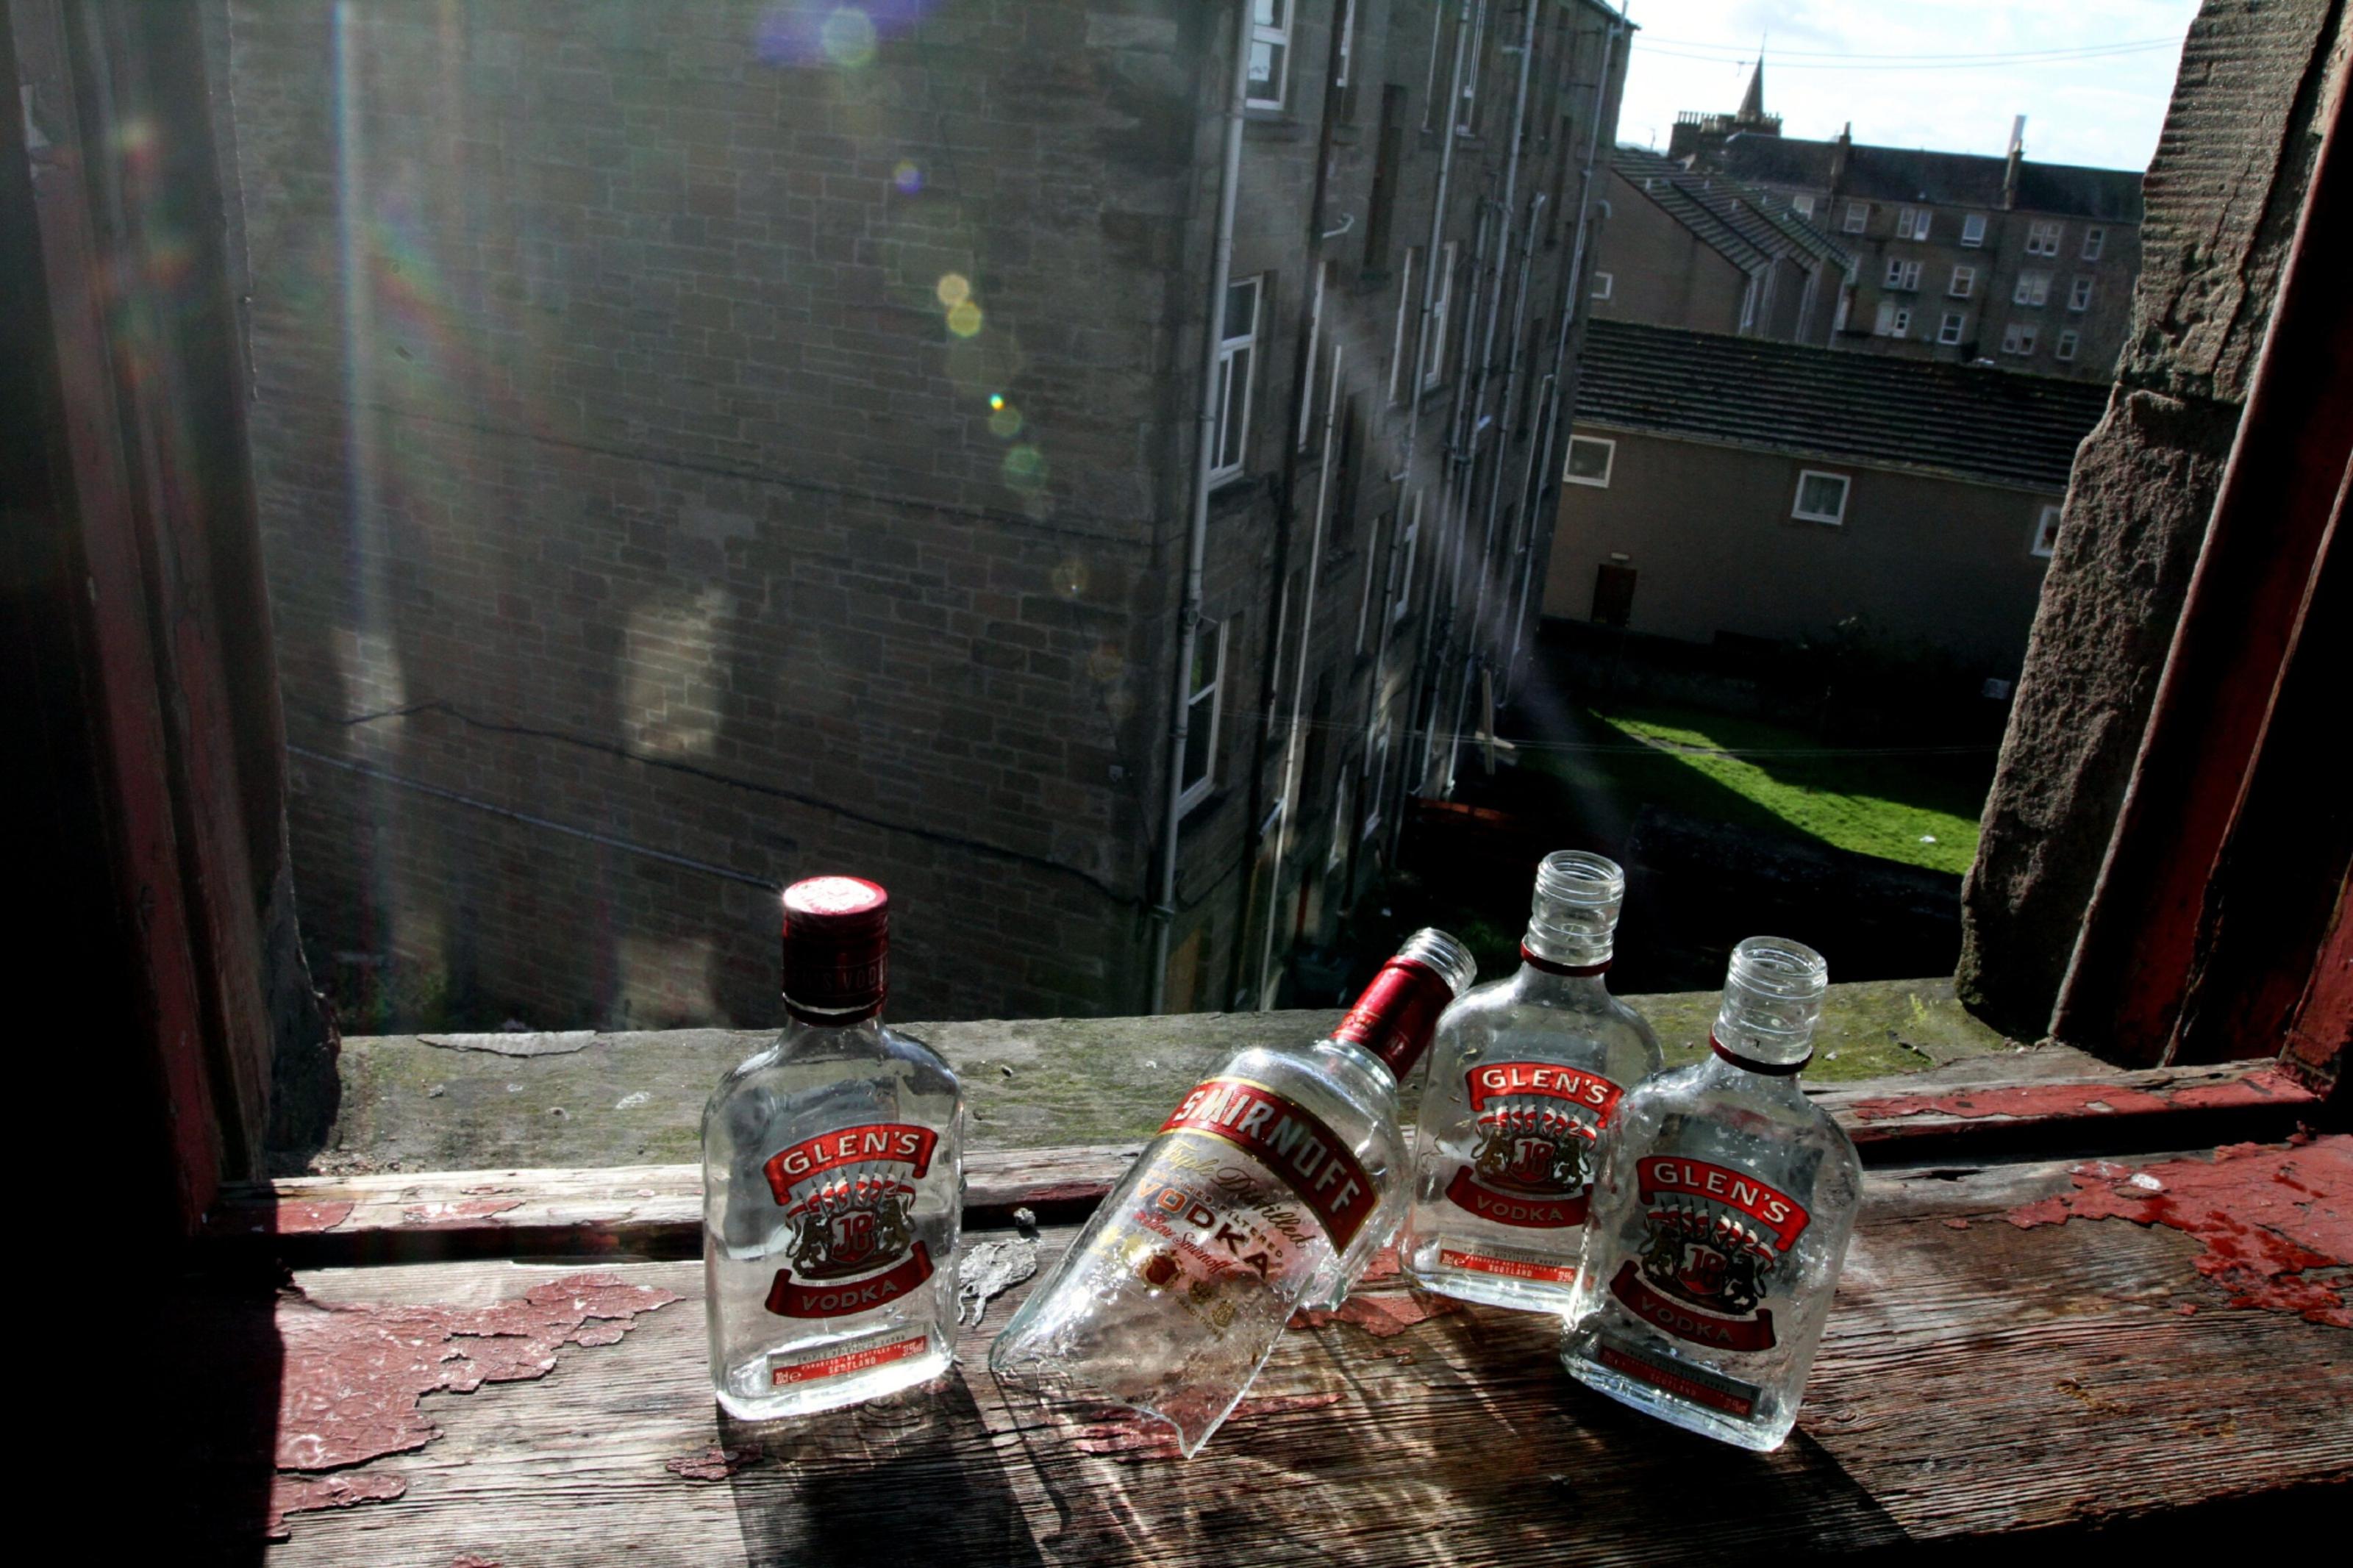 Some bottle were left behind